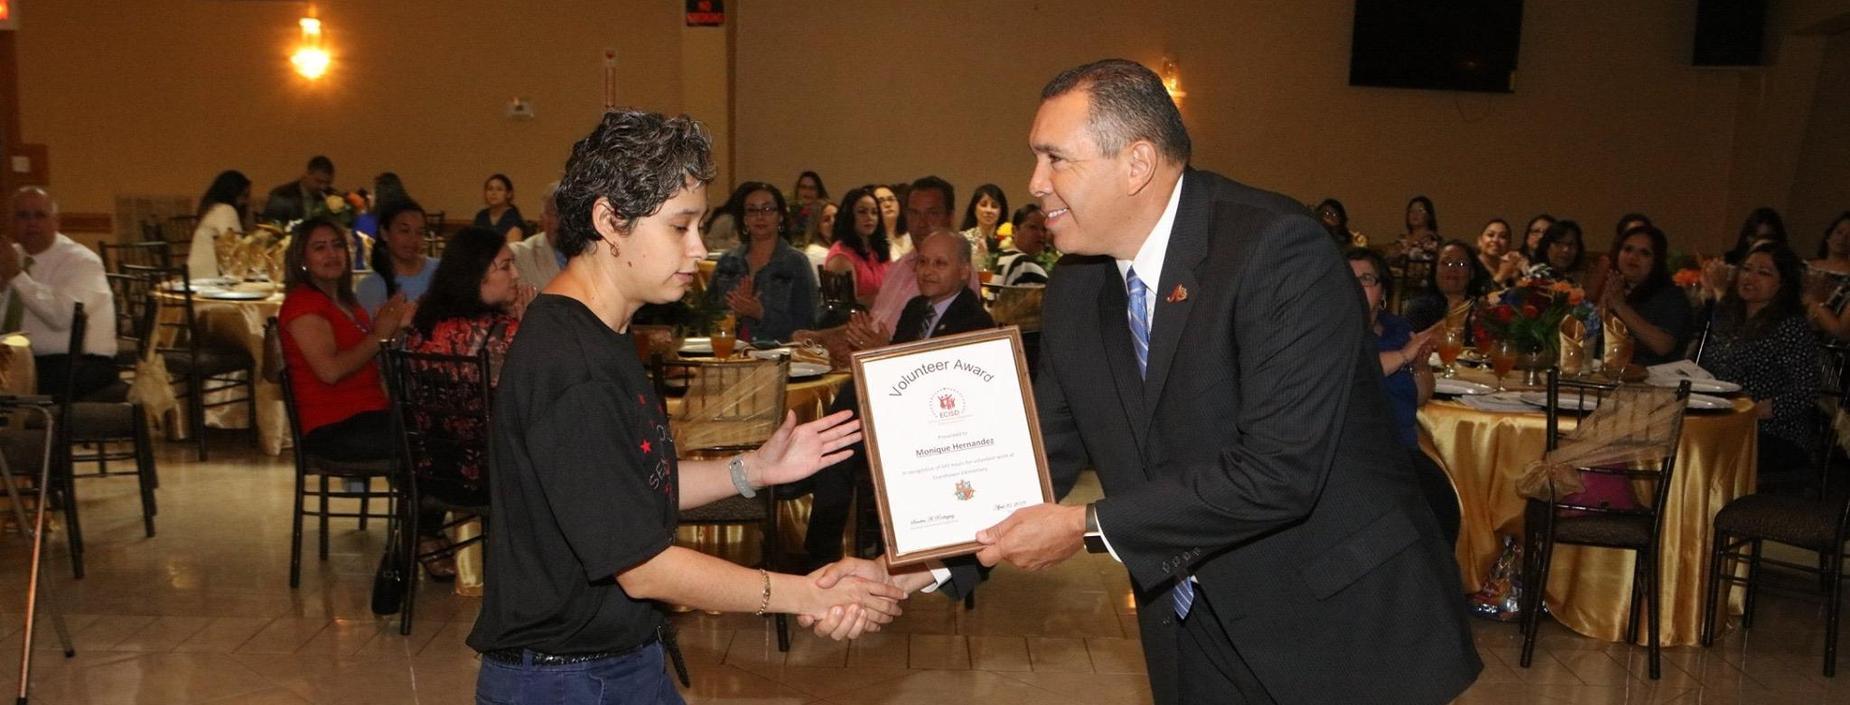 Volunteer Monique receives award.